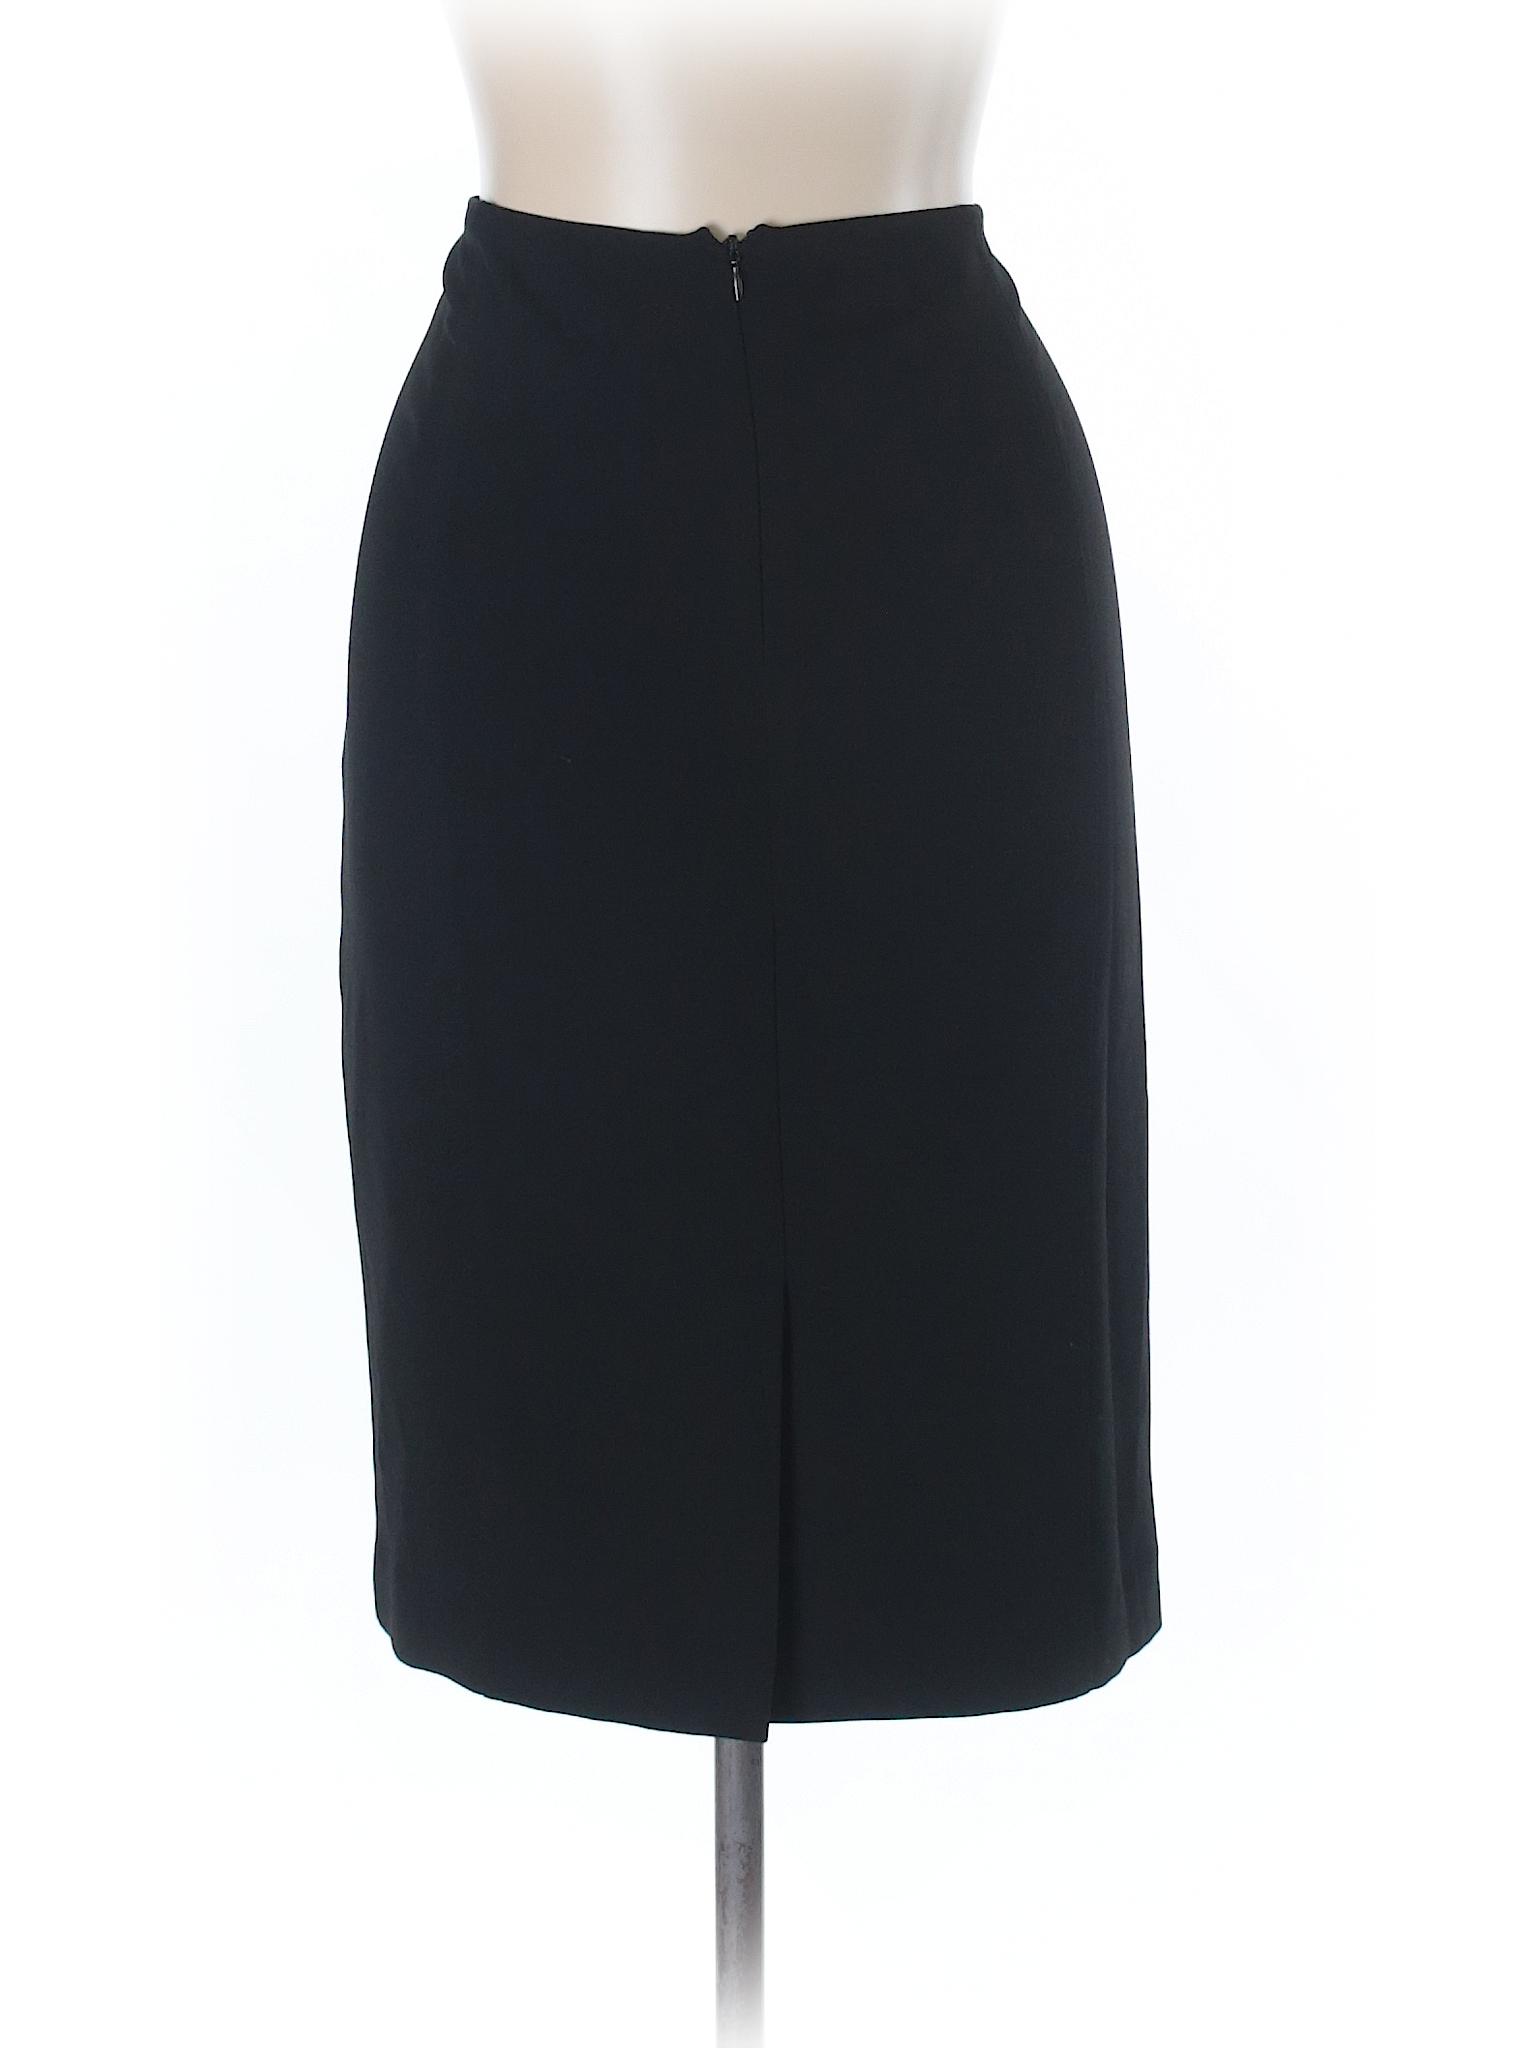 Casual Skirt Skirt Skirt Boutique Casual Skirt Casual Boutique Boutique Casual Boutique qFASSWf